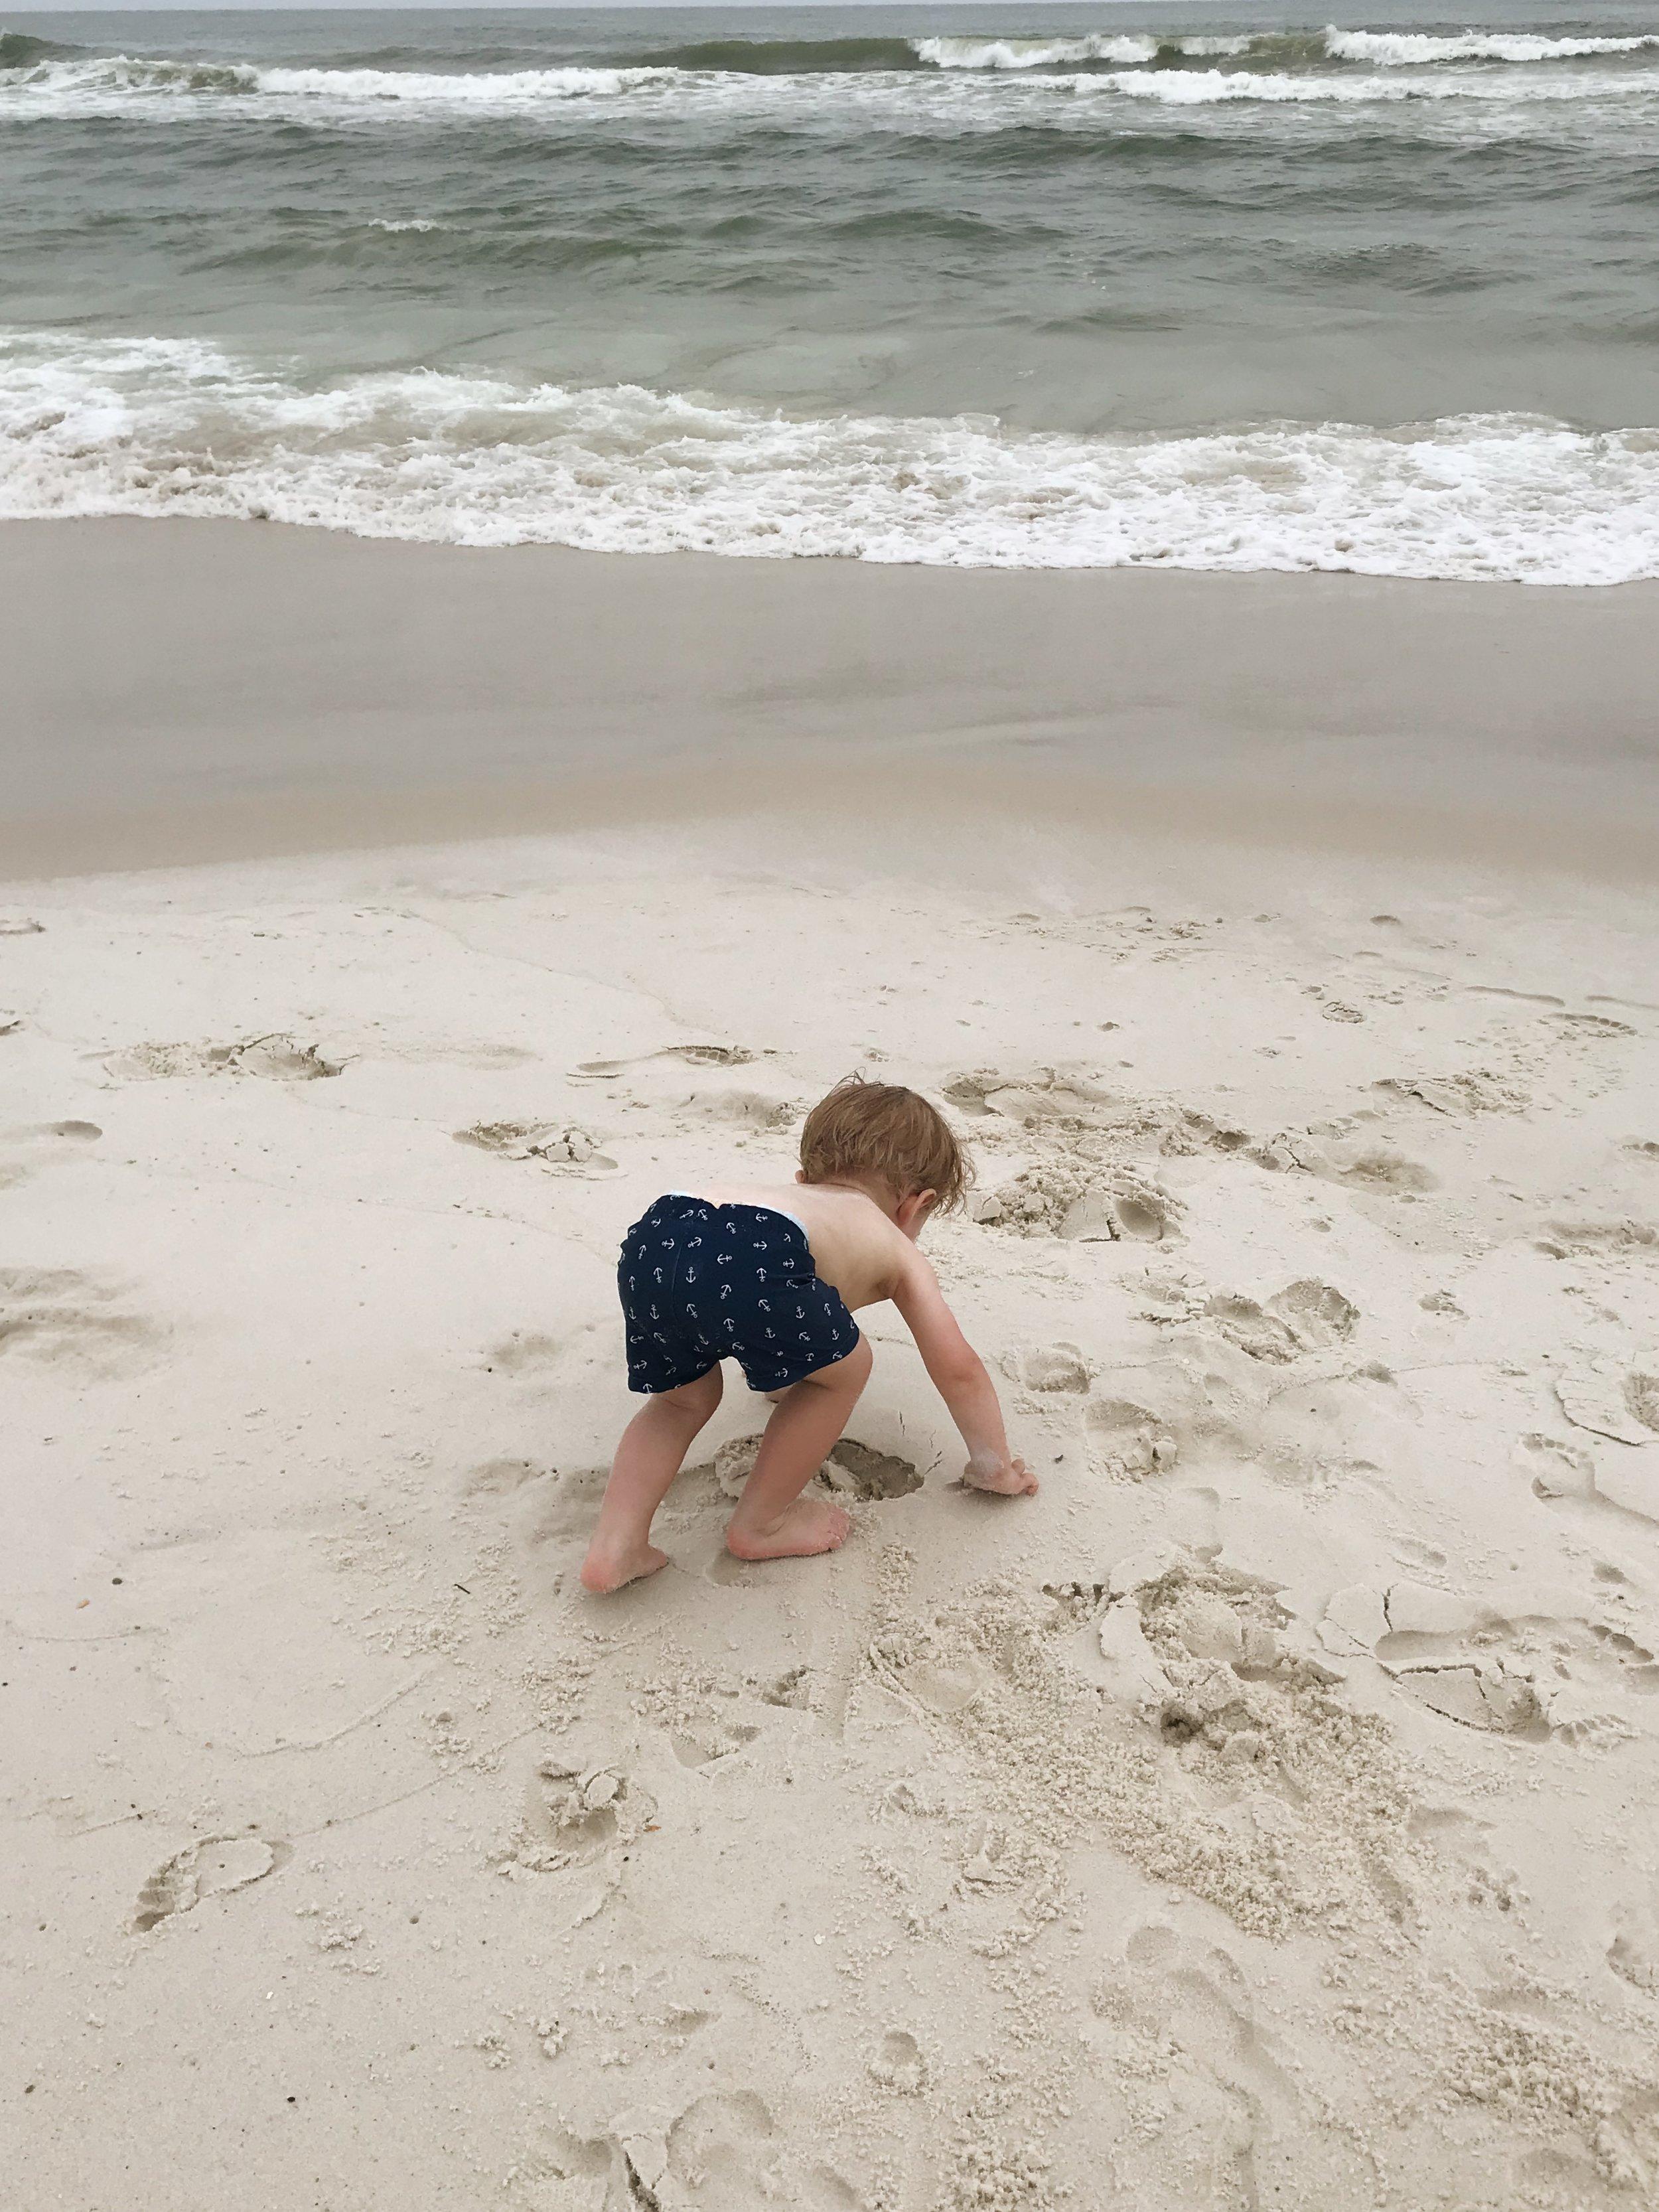 Patrick crab walking on the beach.